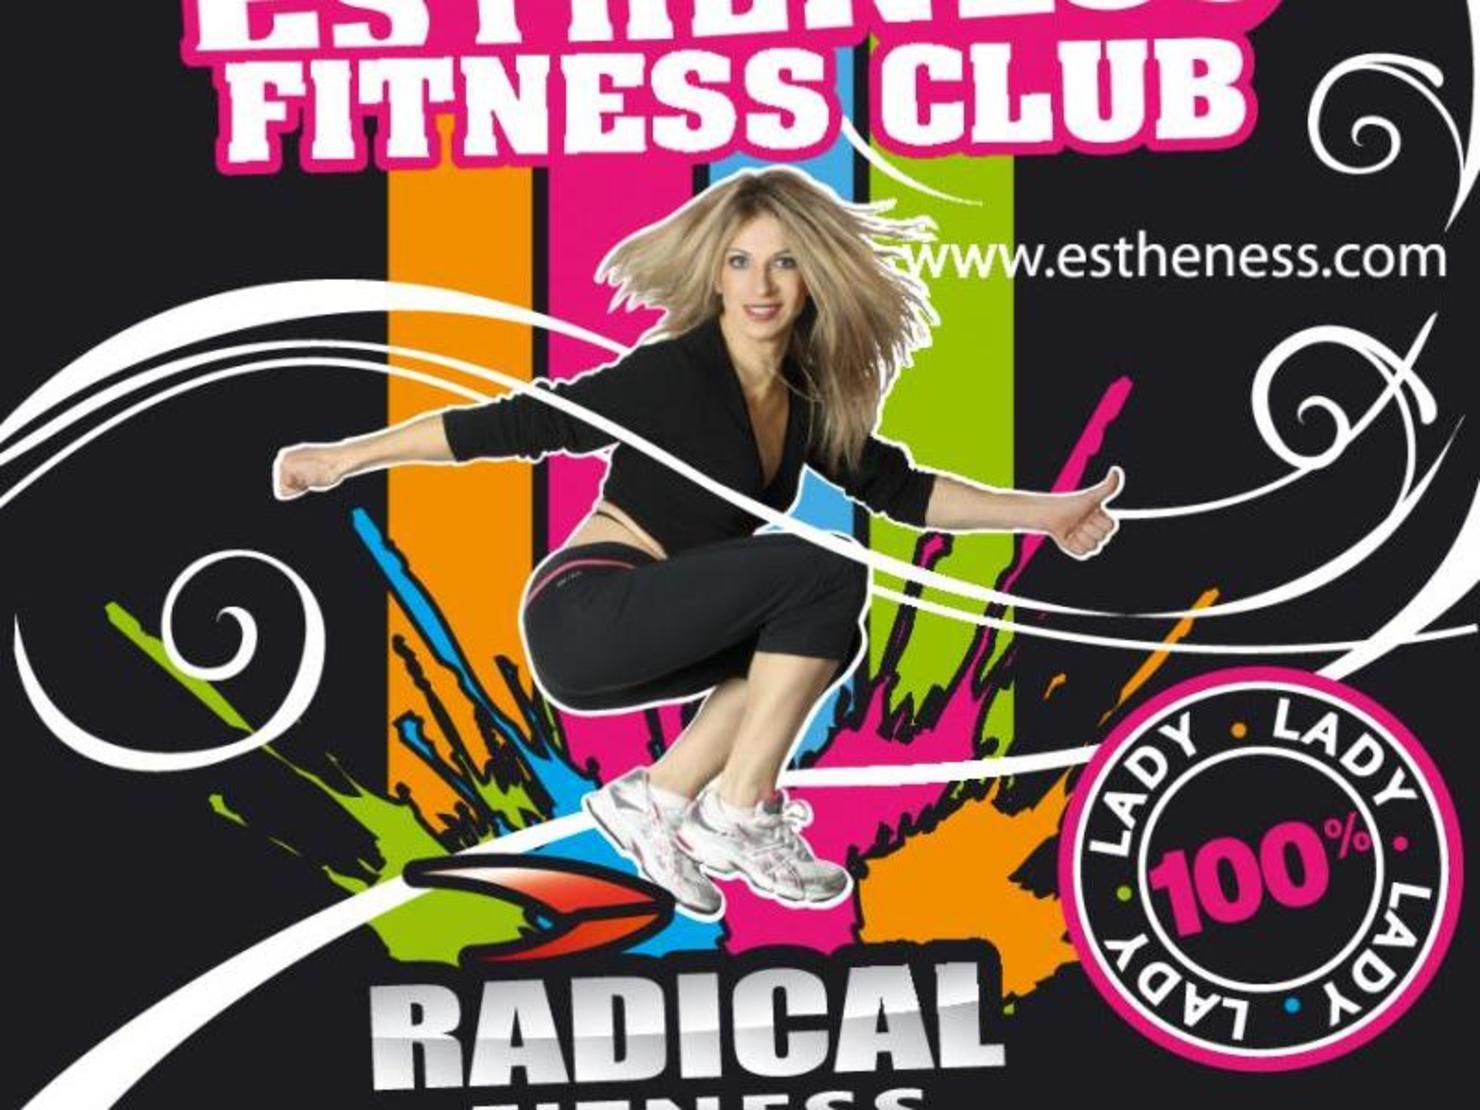 Esthéness Fitness Club